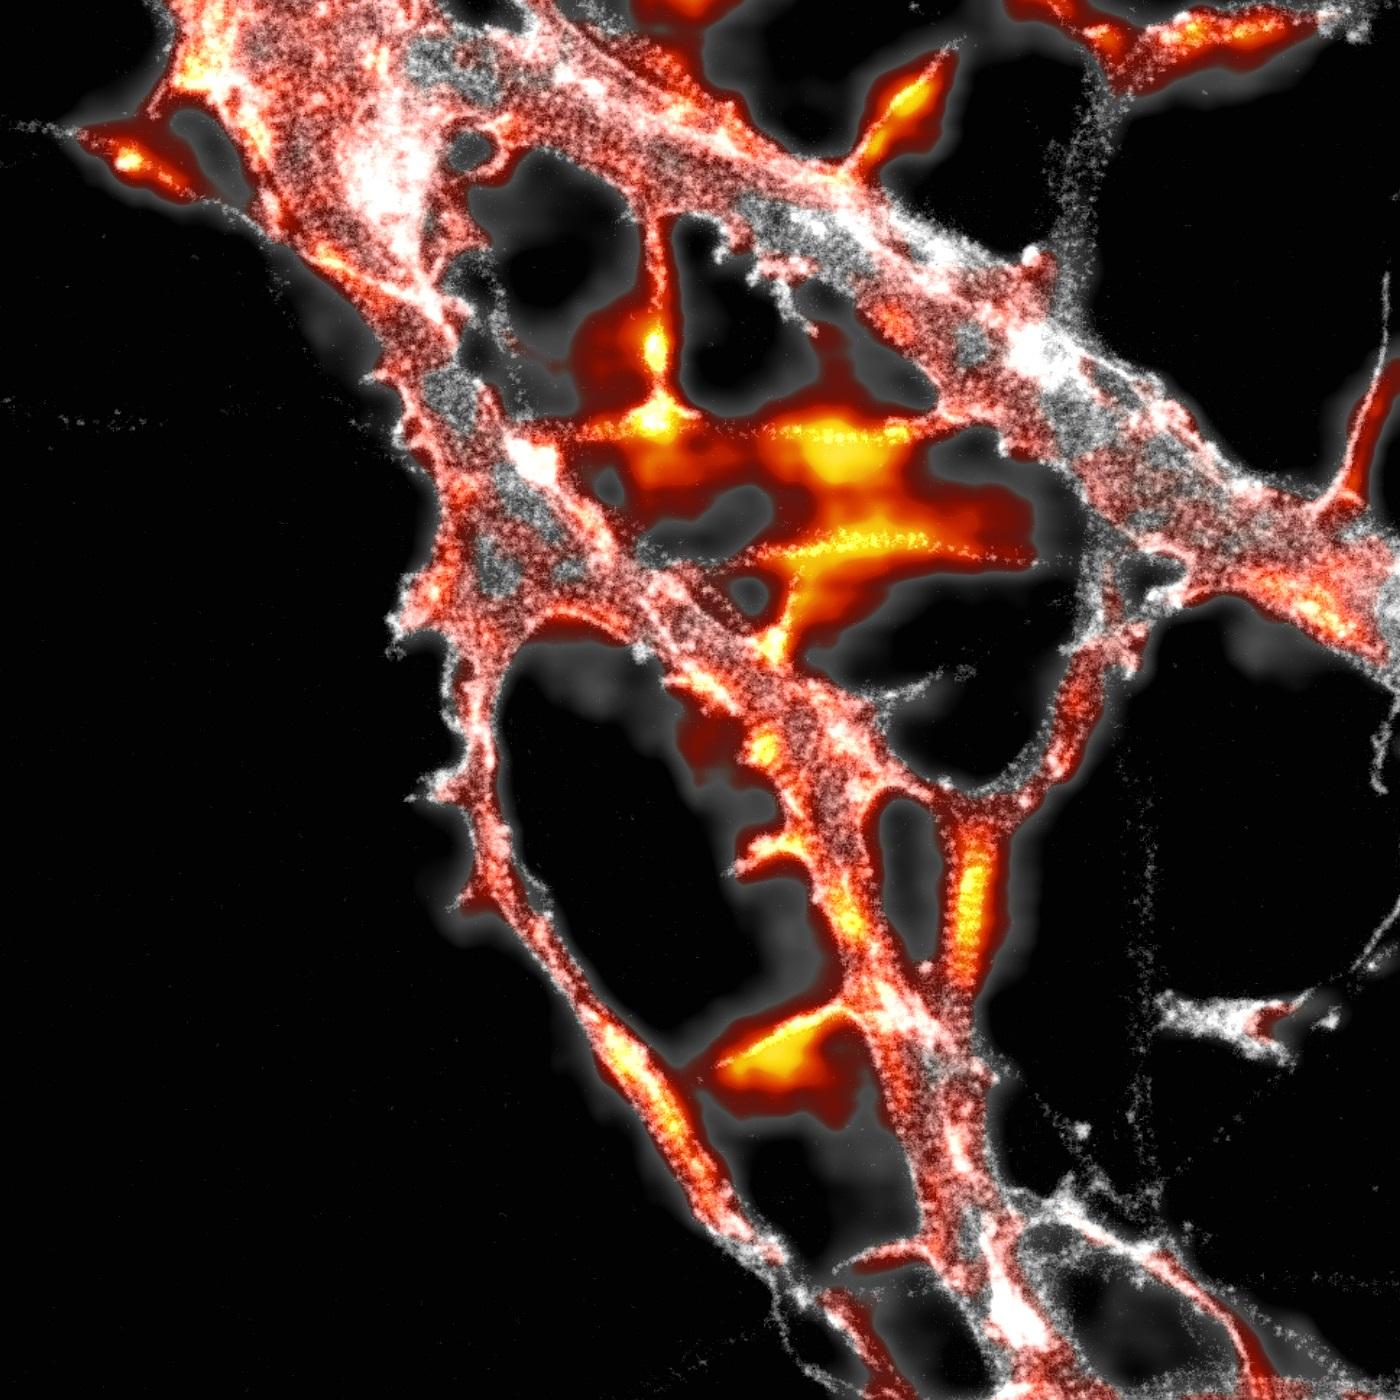 NeuronalActinLattice_QualityMap.jpg